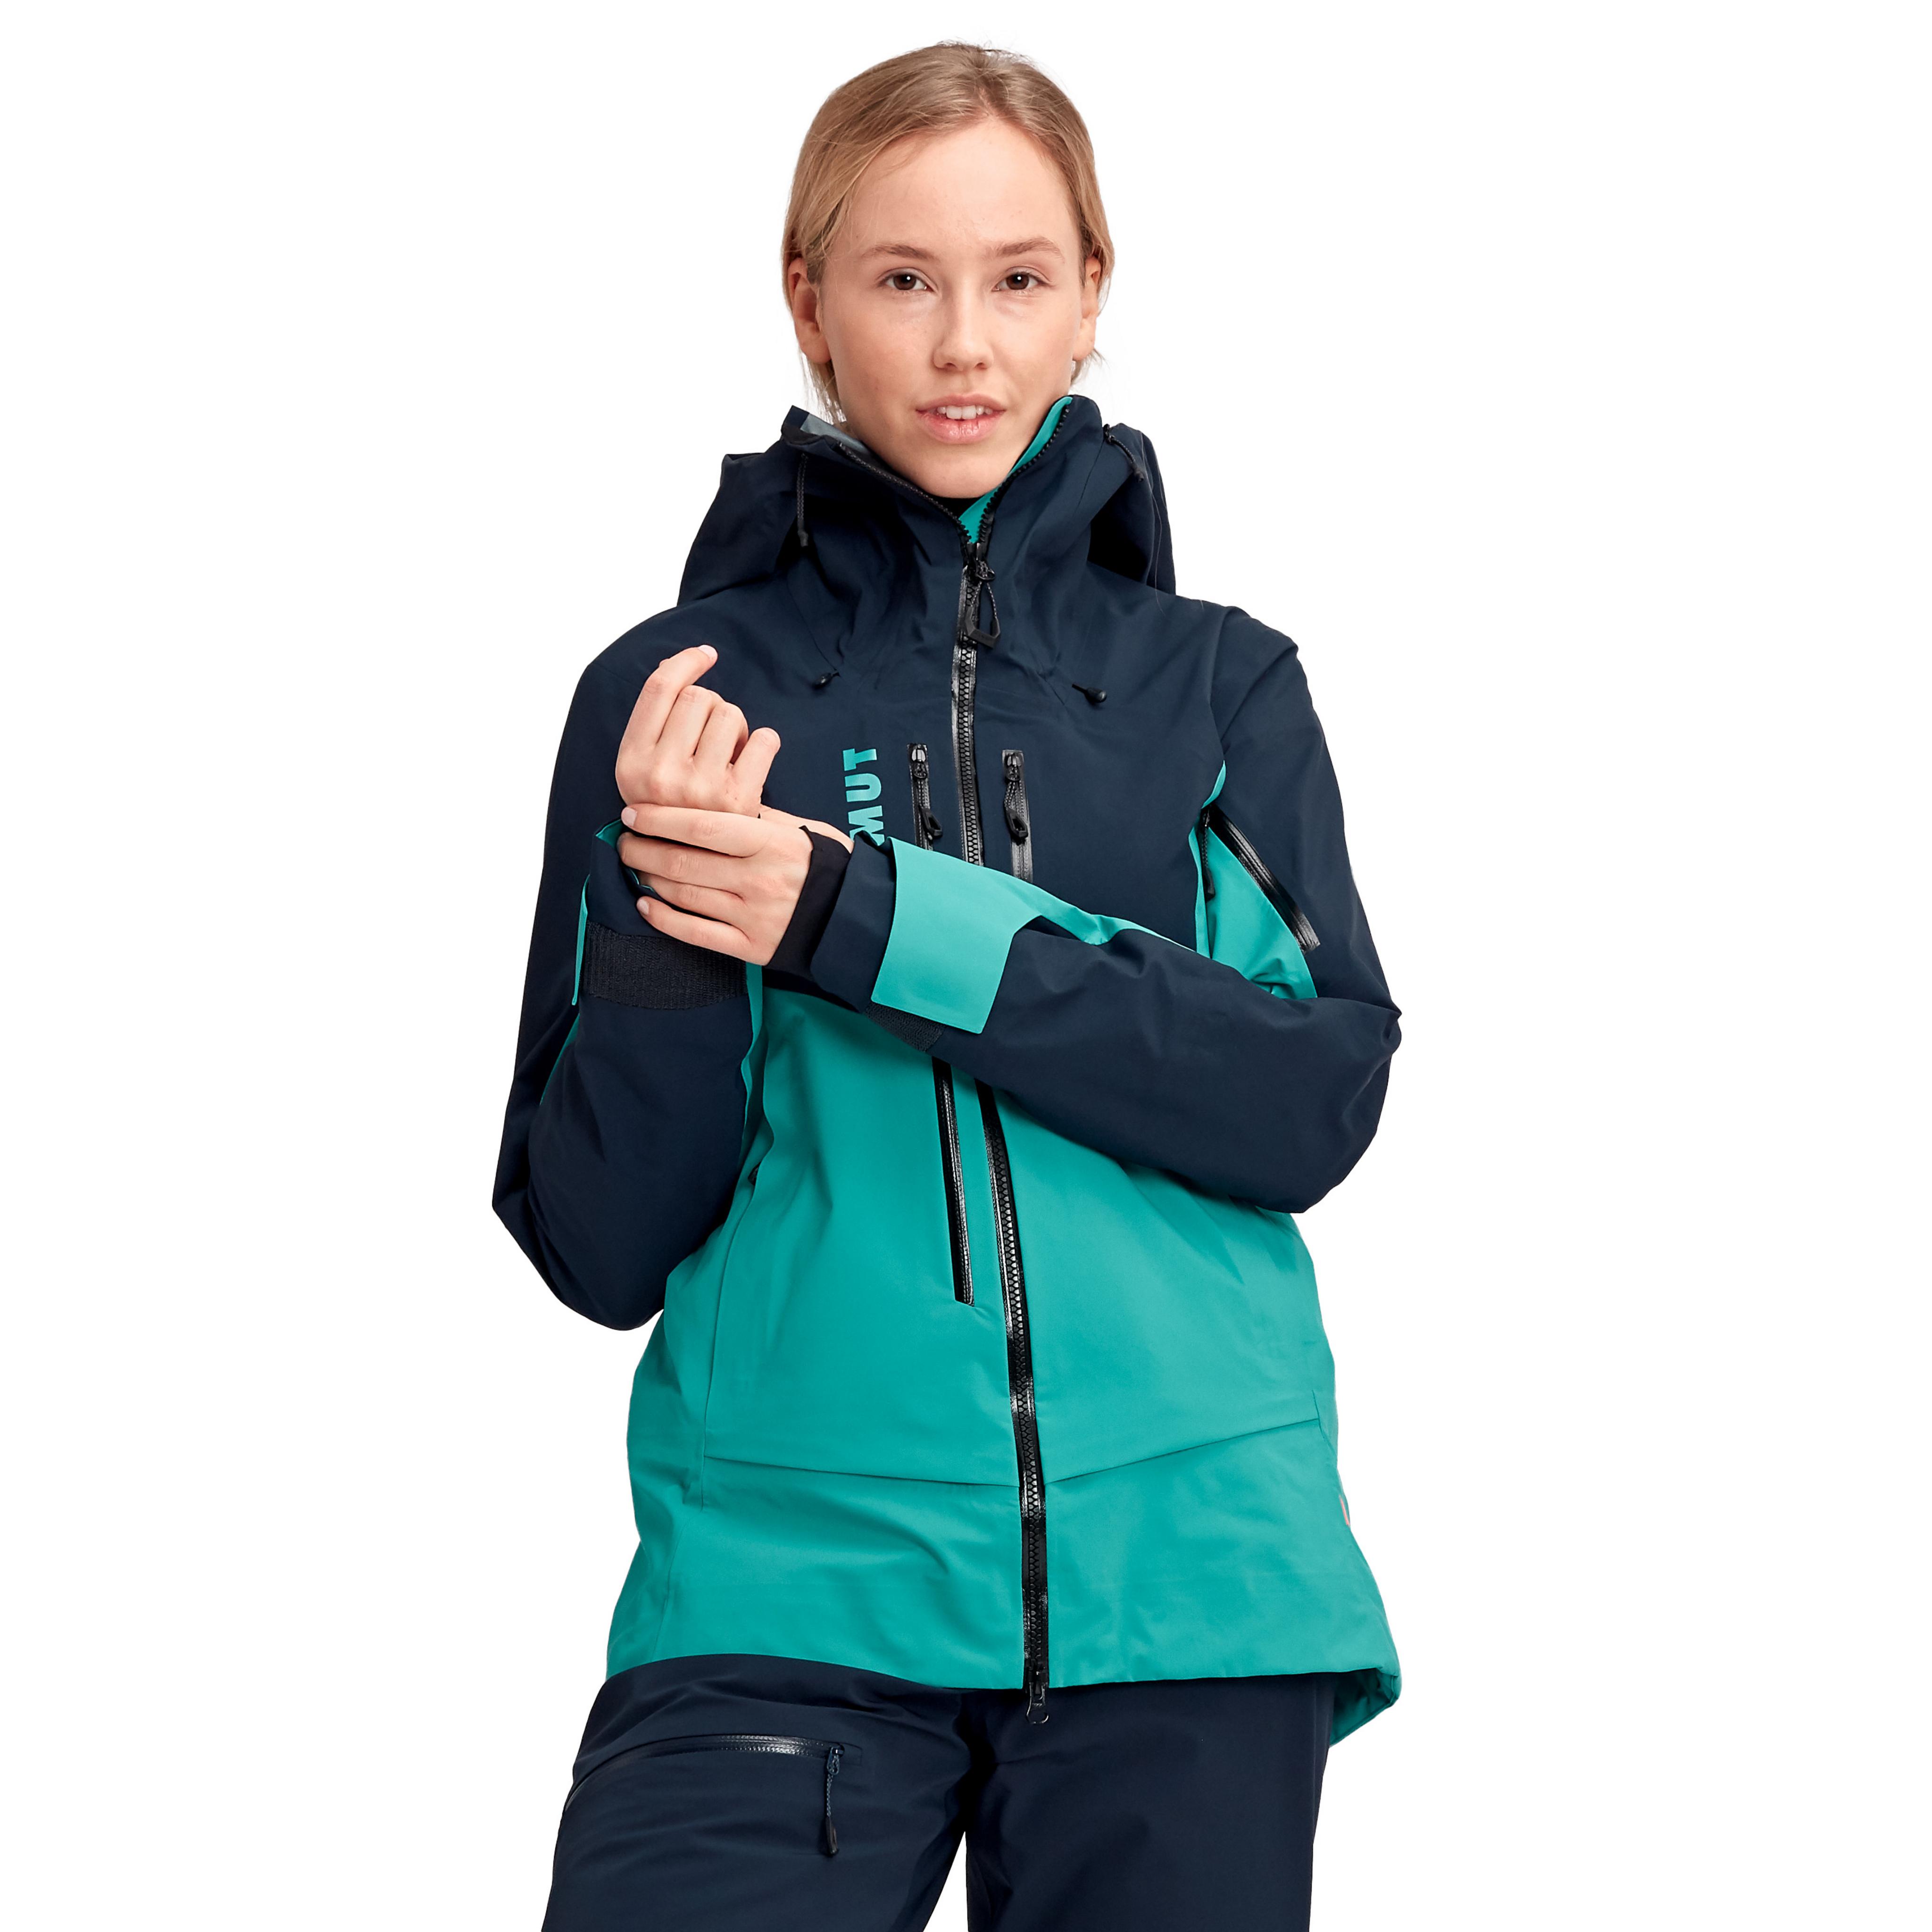 La Liste Pro HS Hooded Jacket Women product image